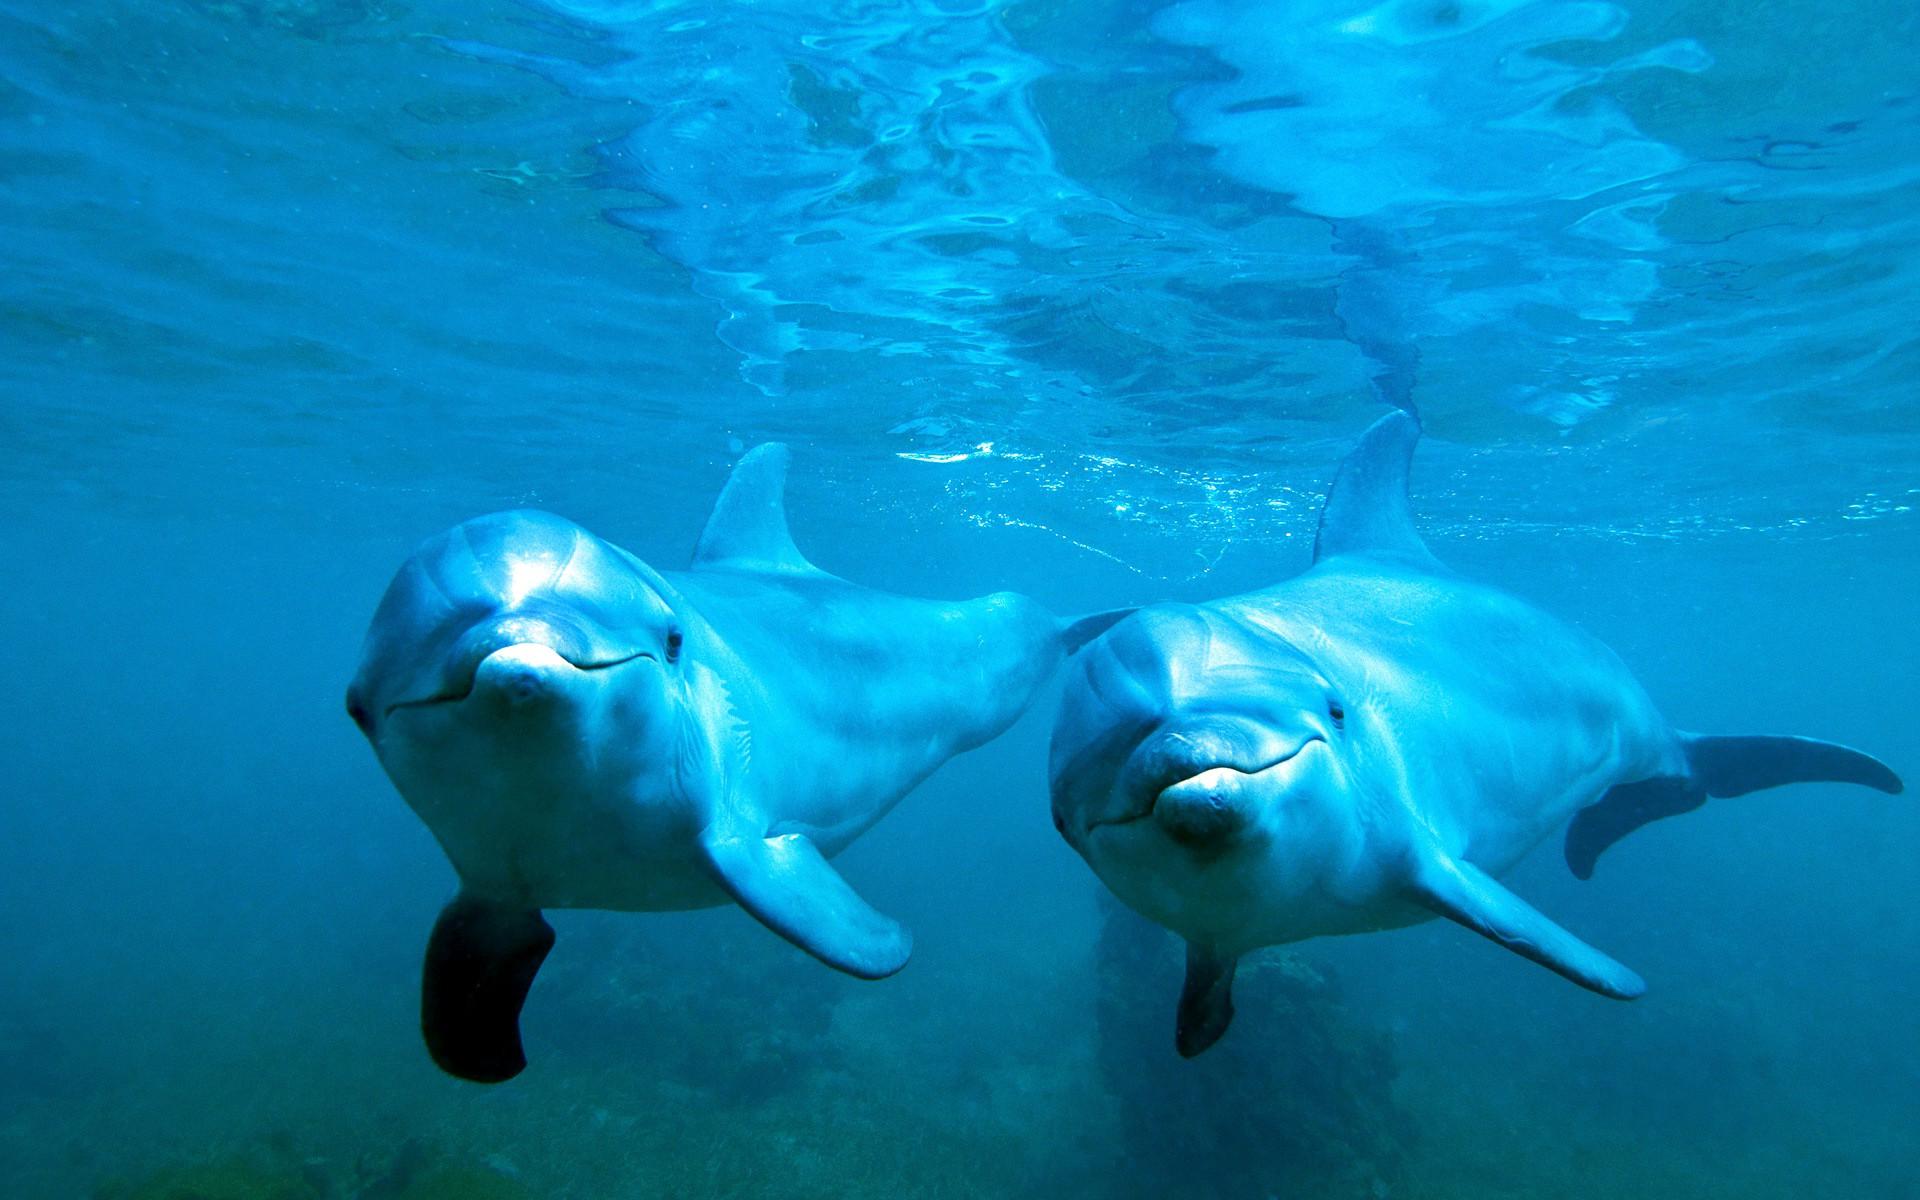 Wallpaper : animals, sea, water, nature, blue, underwater ...